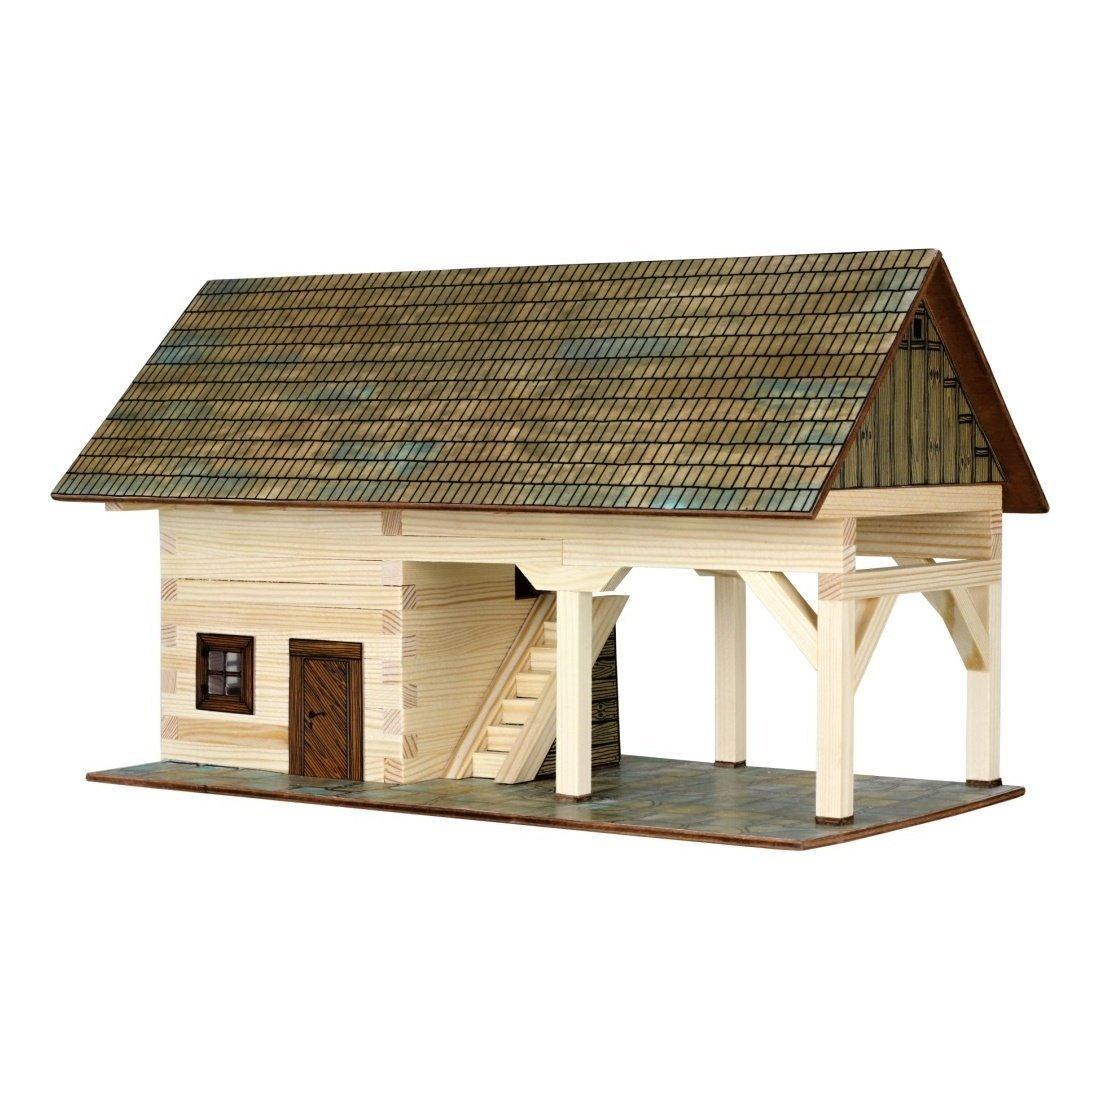 Set constructie arhitectura Sopron, 131 piese din lemn, Walachia